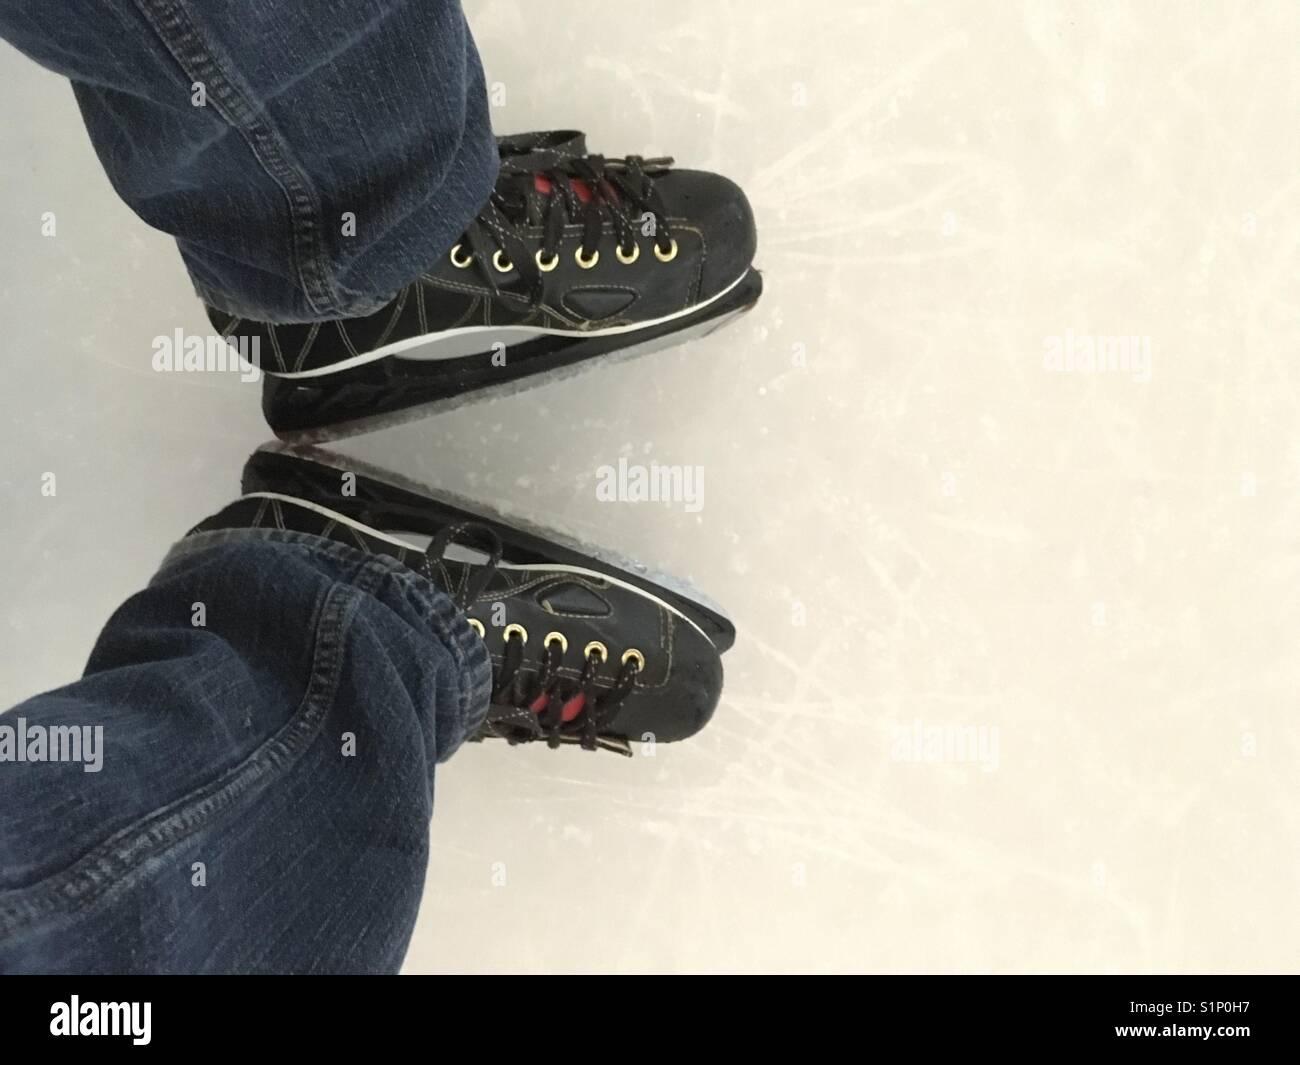 Preparing to ice skate - Stock Image